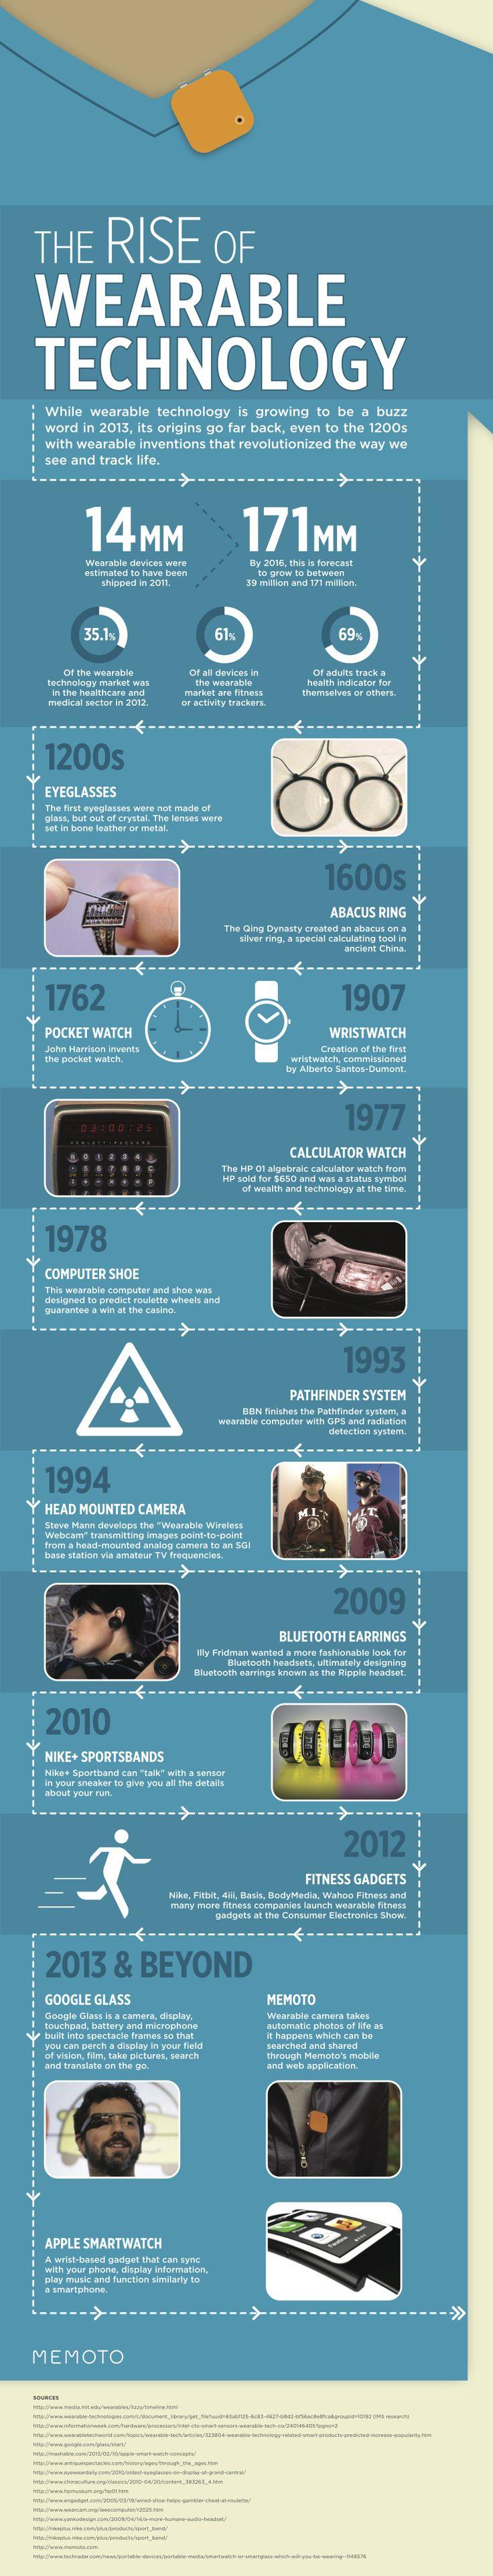 Mejores 8 Imgenes De Tech No Lo Gy En Pinterest Tecnologia Bec Battery Eliminator Circuit Algunascosascom The Rise Of Wearable Technology Infographic